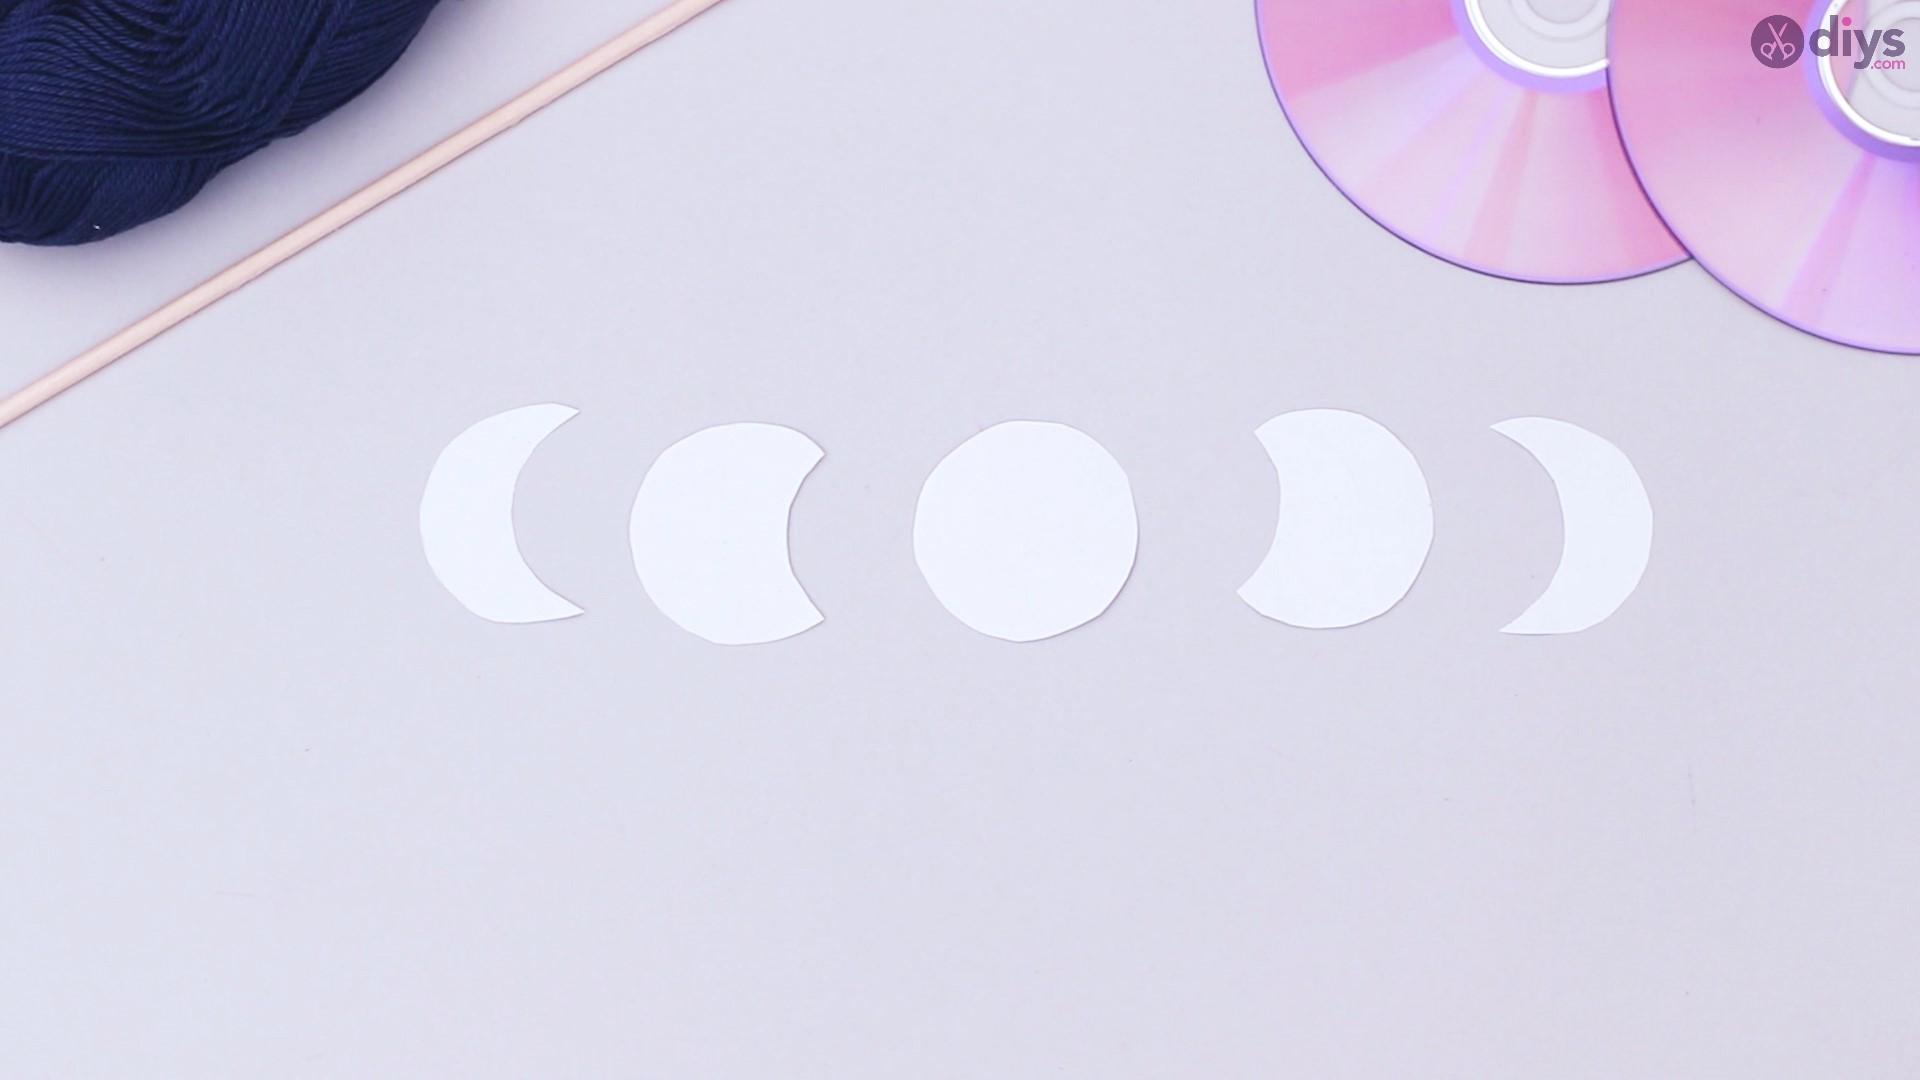 Lunar eclipse cd wall hanging (1)